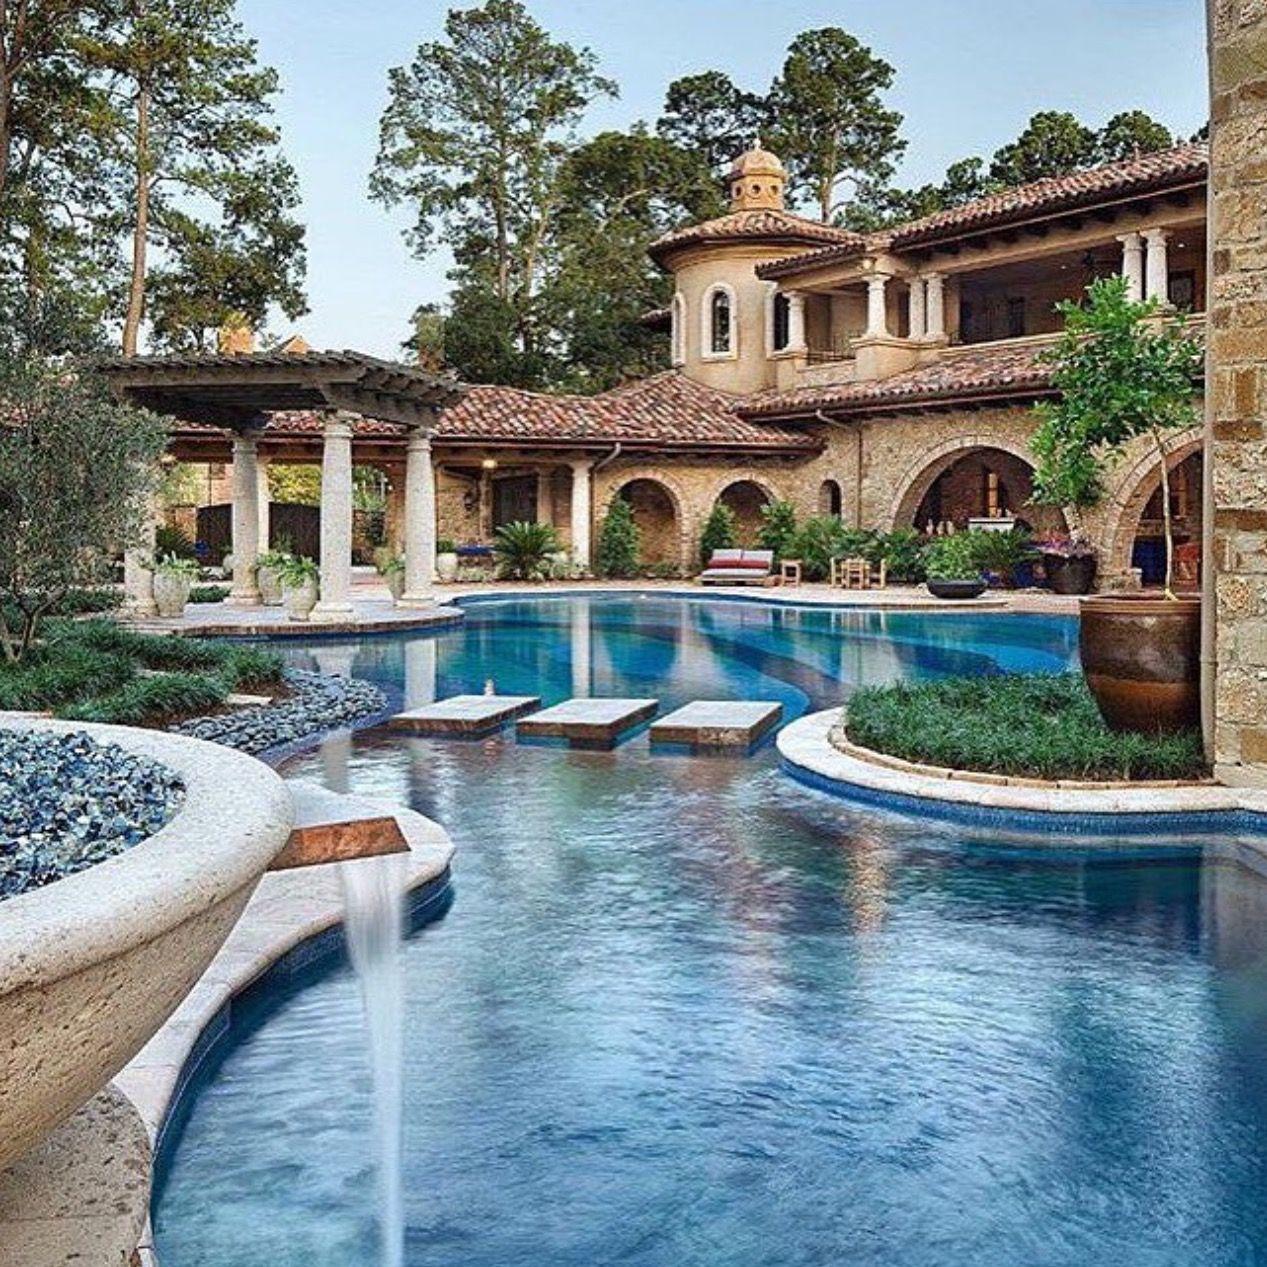 Aesthetic Elegance & Opulent